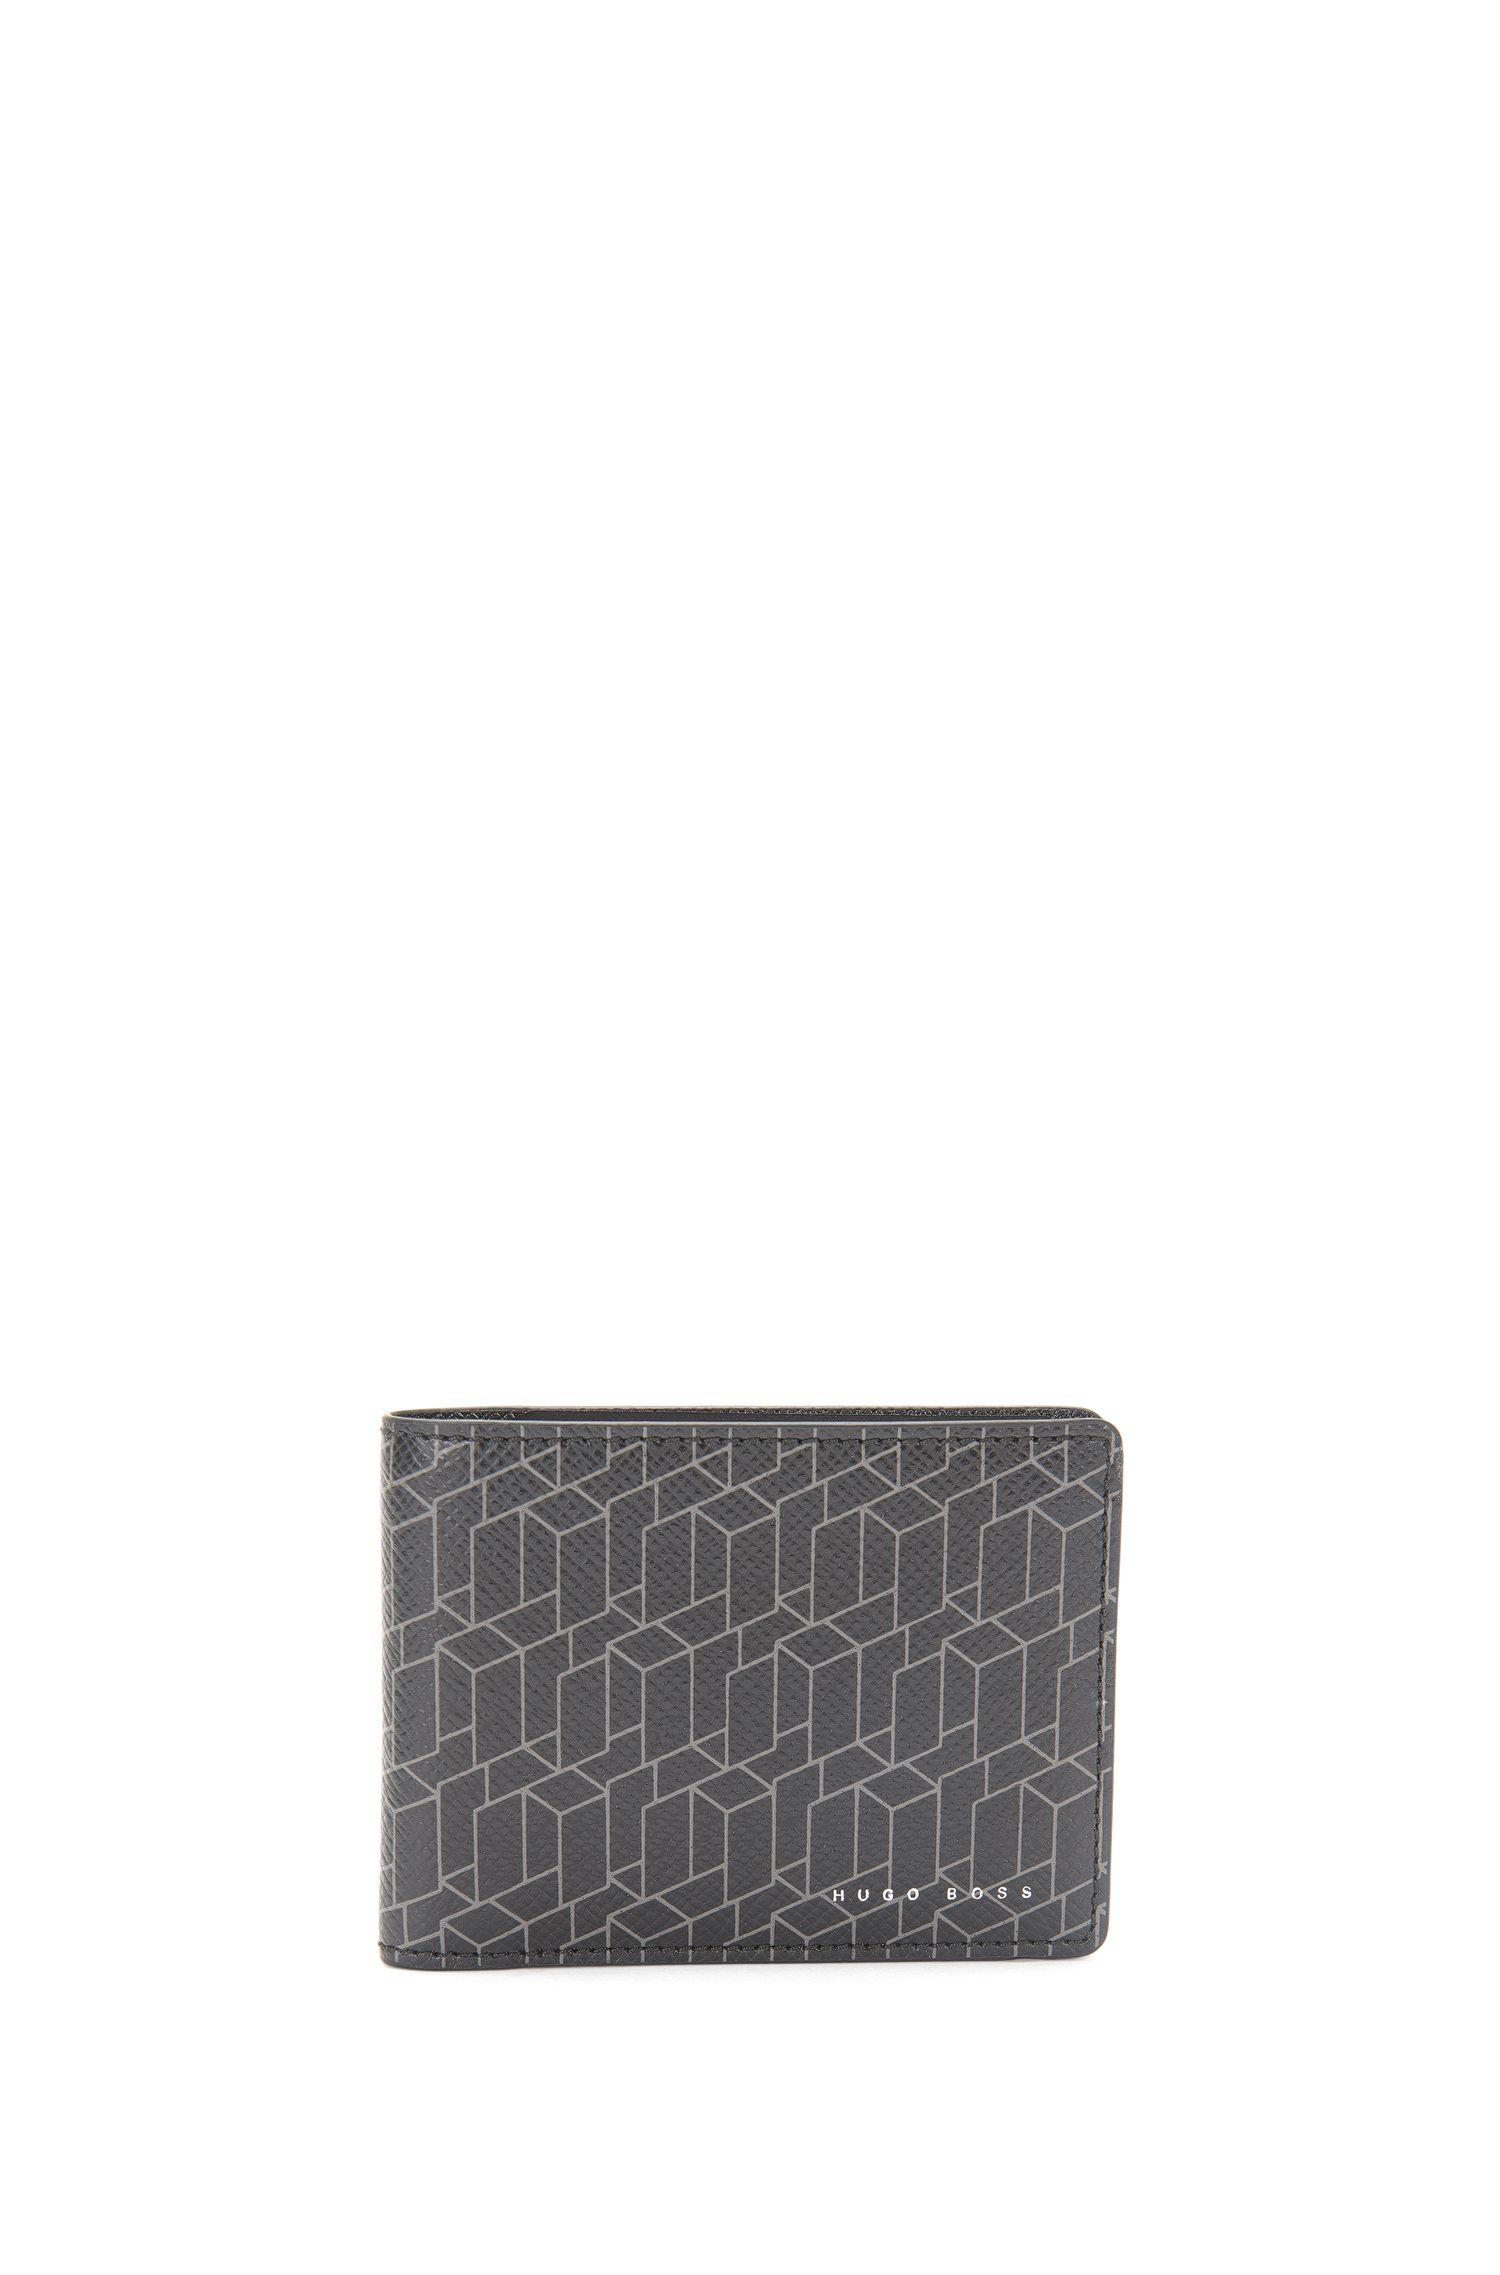 Gemusterte Geldbörse aus Leder: 'Signature H_6 cc'